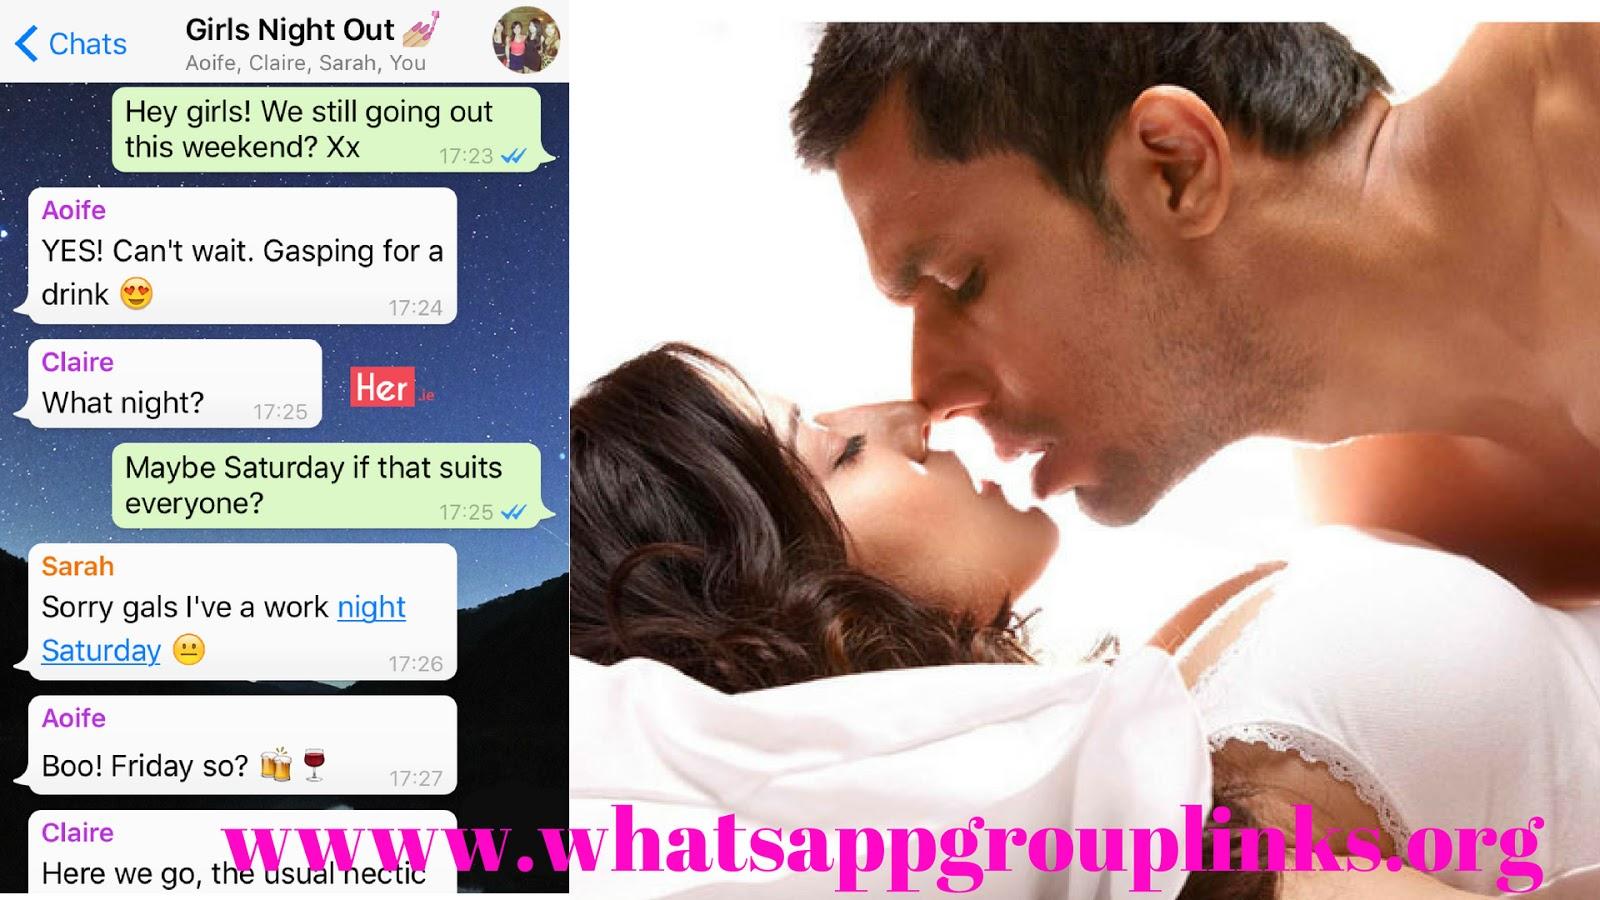 JOIN HOT WHATSAPP GROUP LINKS LIST - Whatsapp Group Links